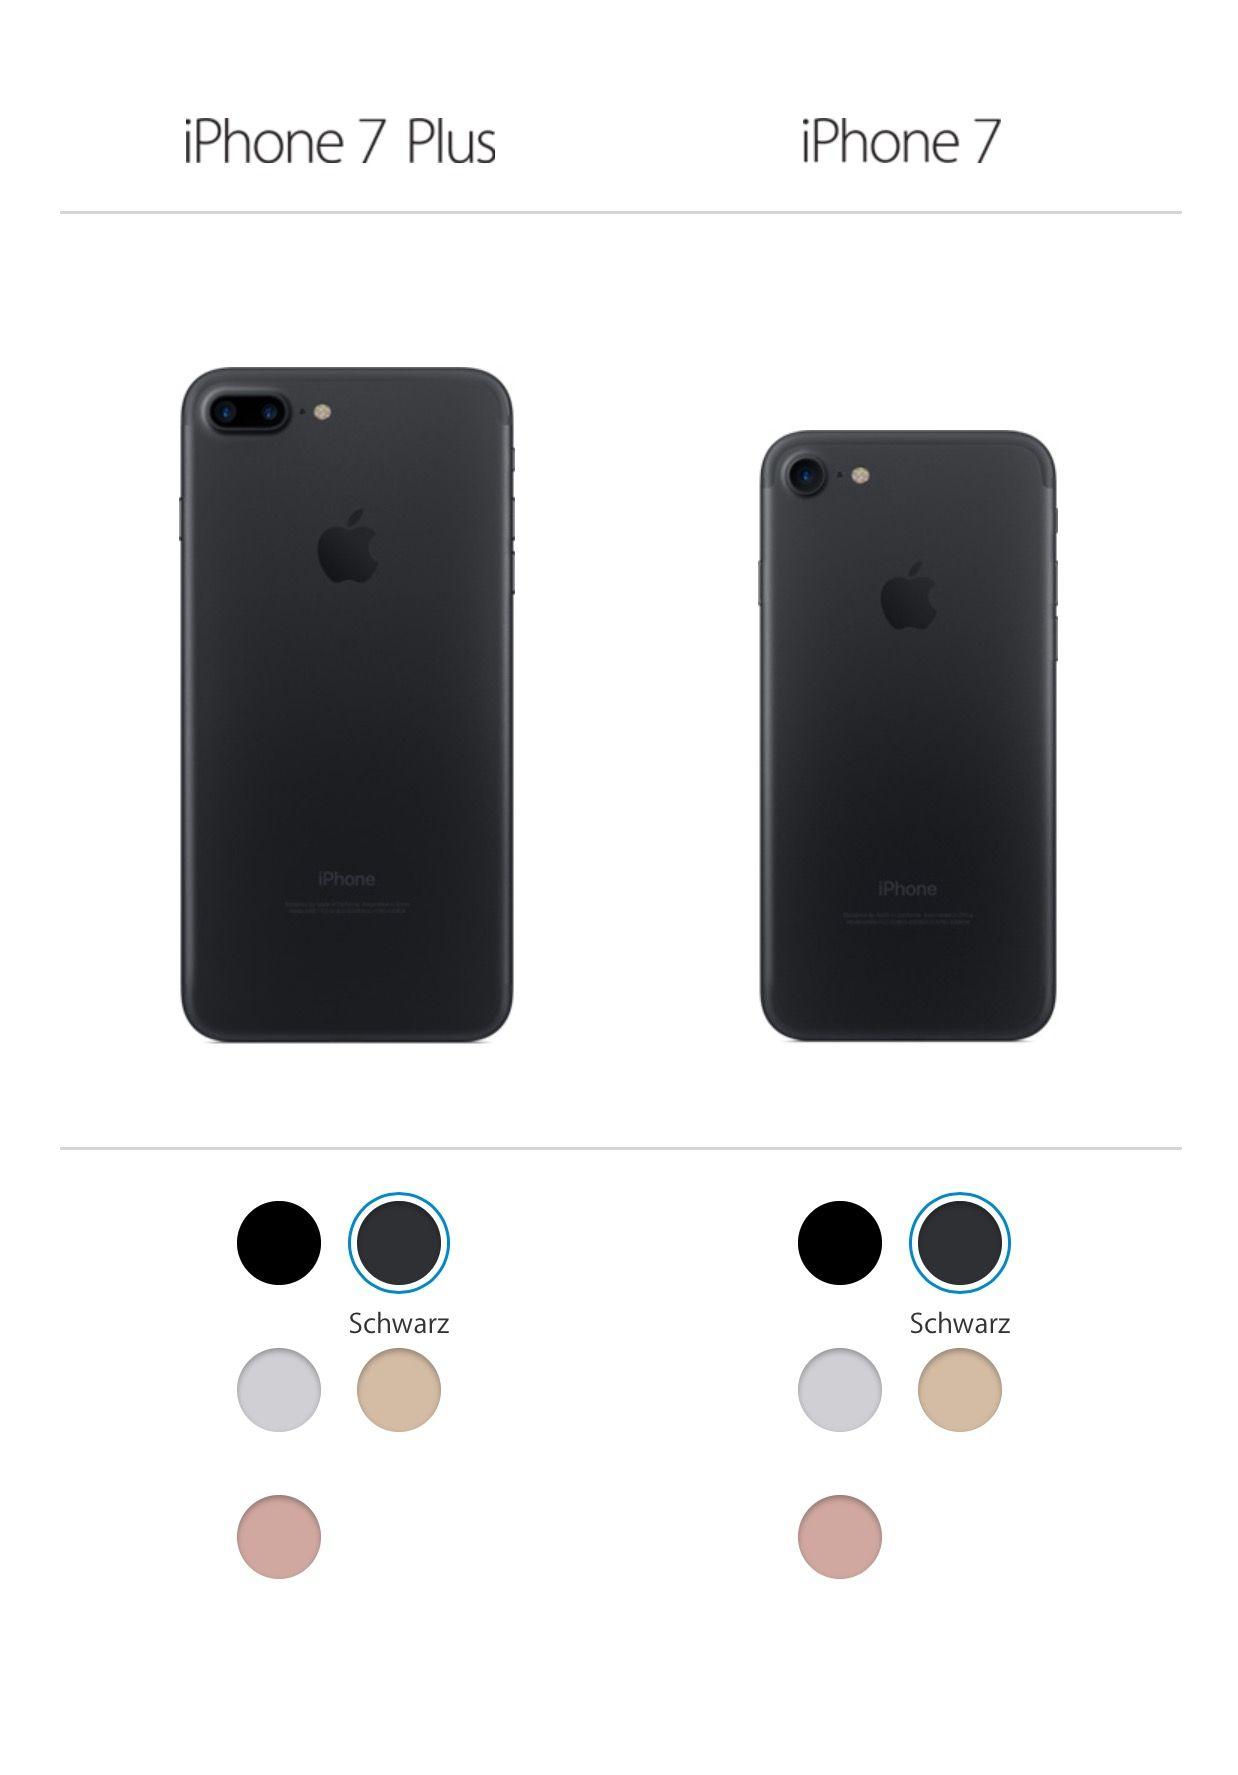 iPhone 7 / plus in Black   F I T S ❤ in 2018   Pinterest   Iphone 7 ...